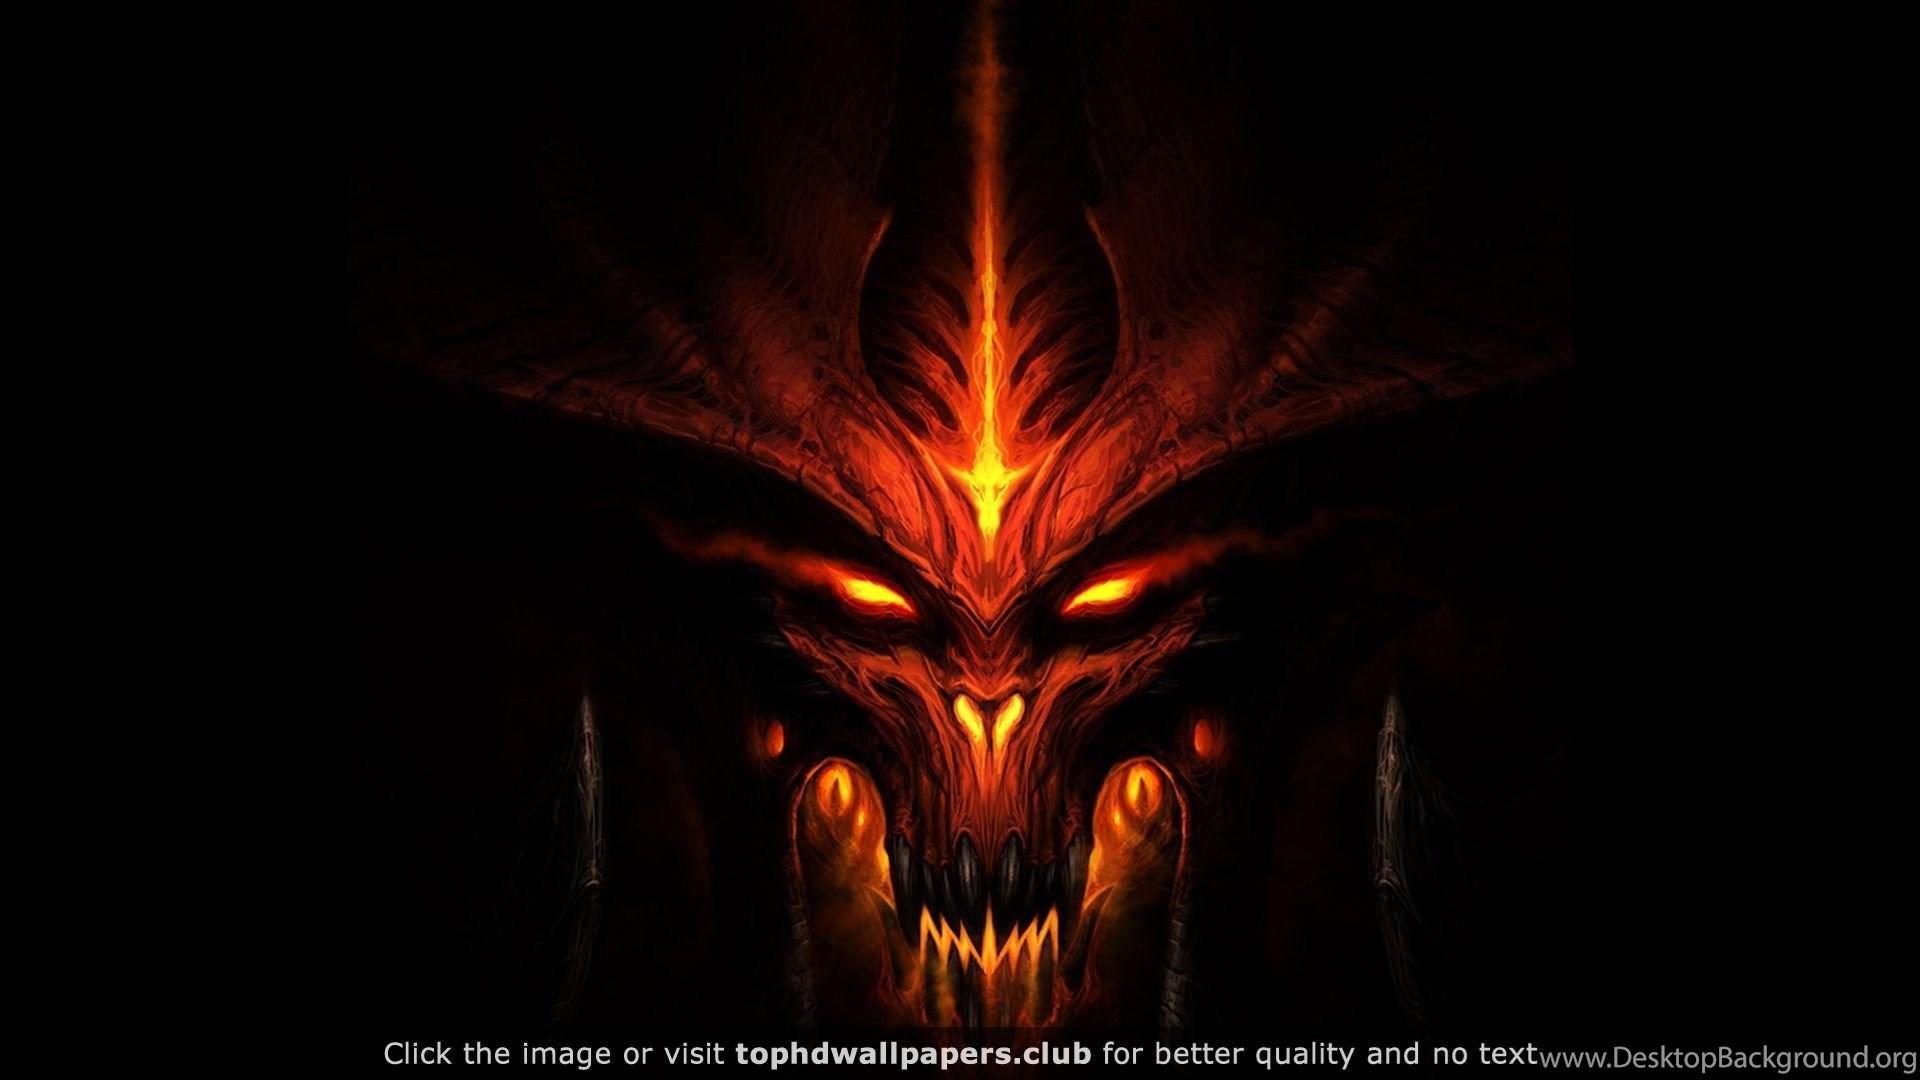 Diablo 3 Game Monster Mug Dark 4k Or Hd Wallpapers For Your